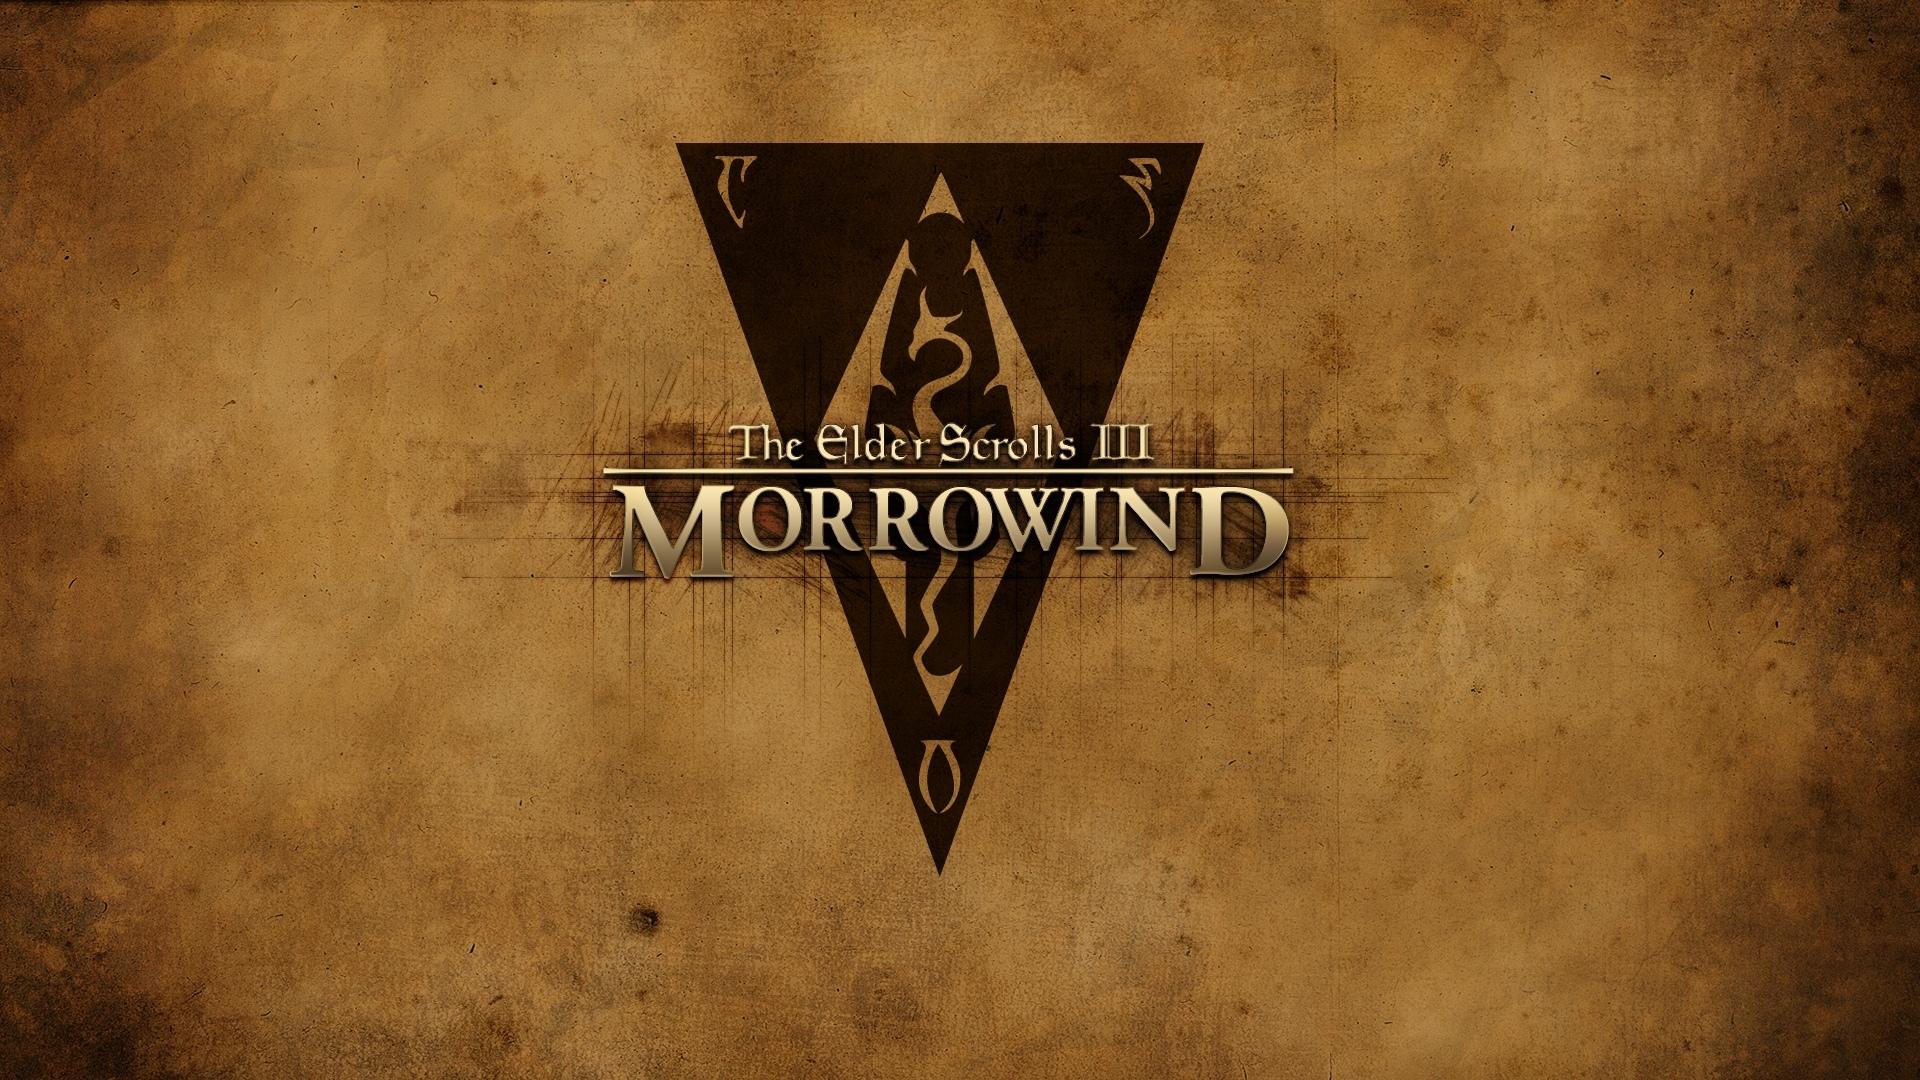 Анонс и трейлер The Elder Scrolls: New North